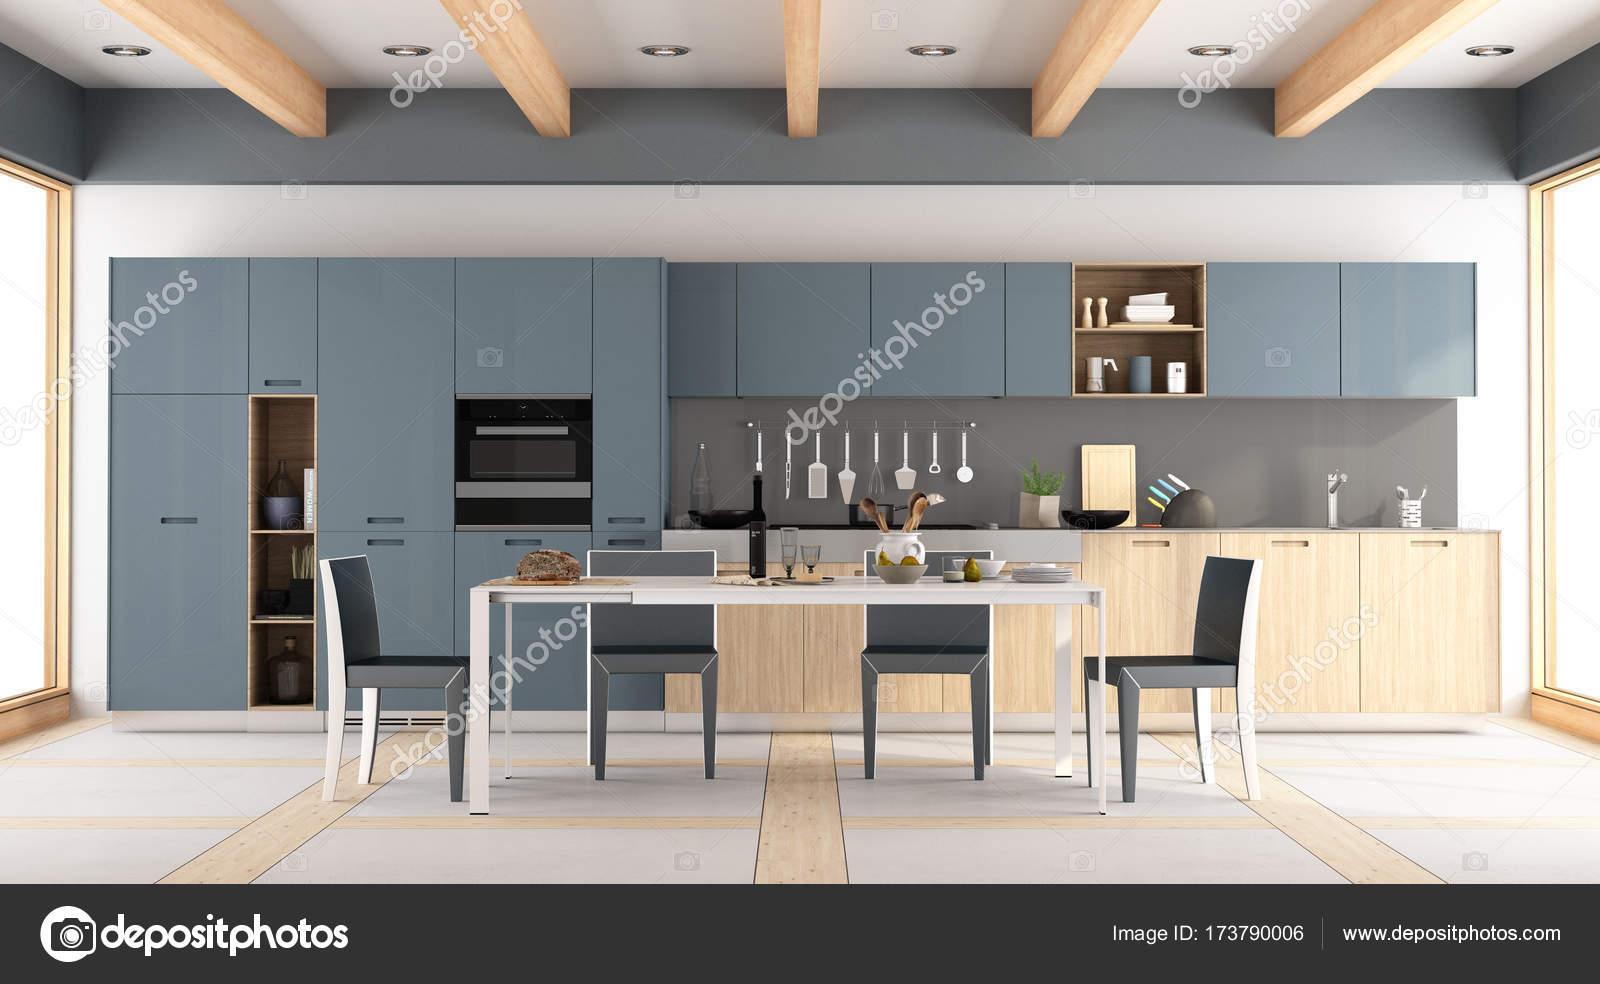 blue kitchen chairs curtain sets 现代木和蓝色厨房 图库照片 c archideaphoto 173790006 现代木和蓝色厨房与餐桌和椅子 3d 渲染 照片作者archideaphoto